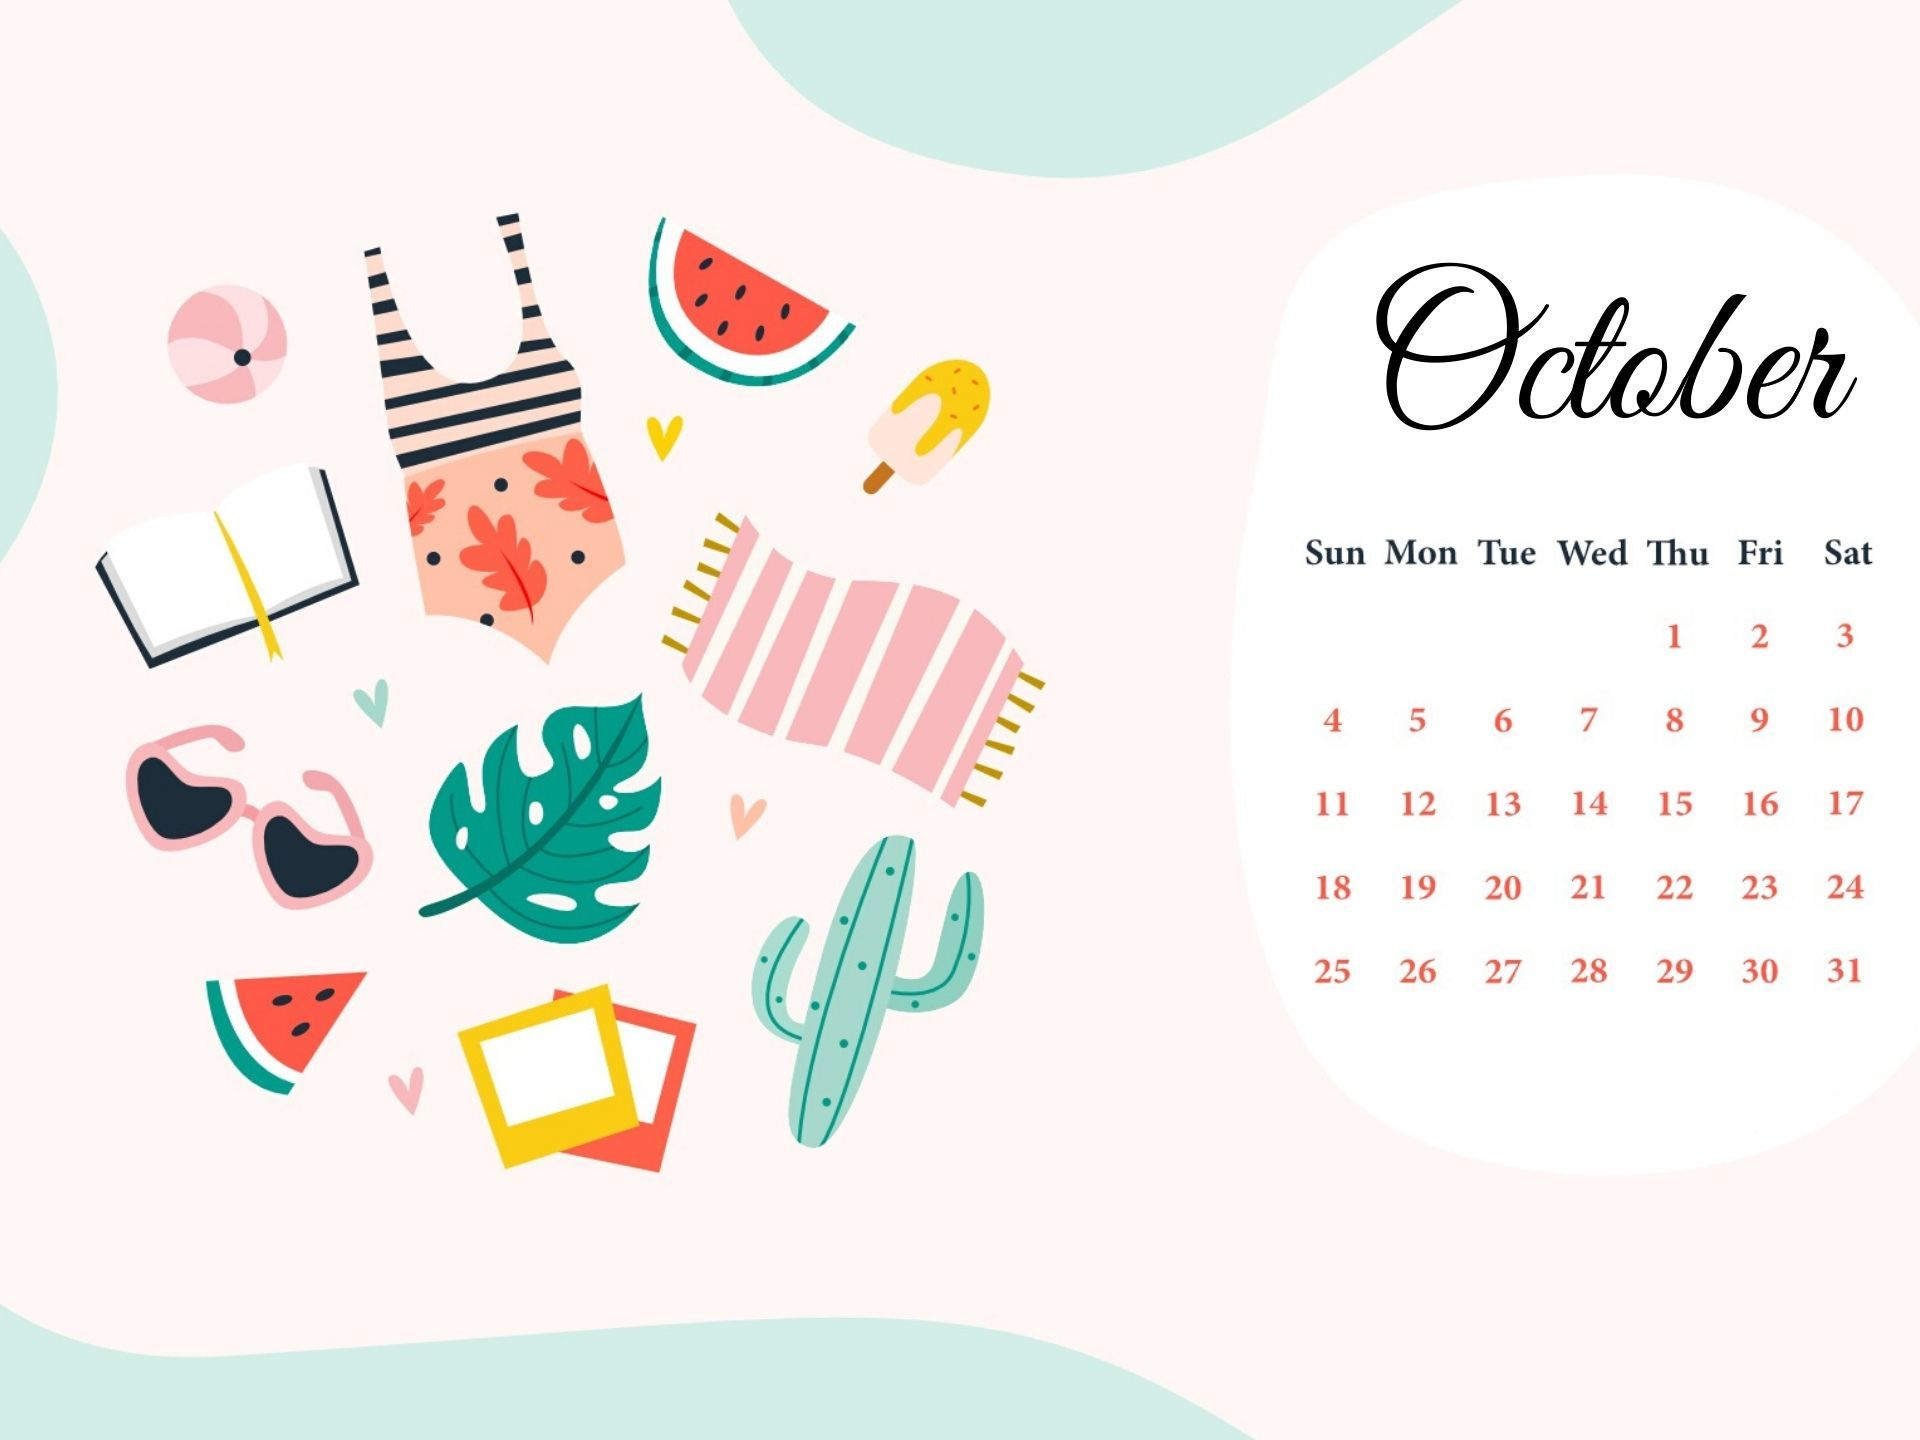 Free Download October 2020 Hd Calendar Wallpaper In 2020 Desktop Wallpaper Calendar Calendar Wallpaper February Wallpaper